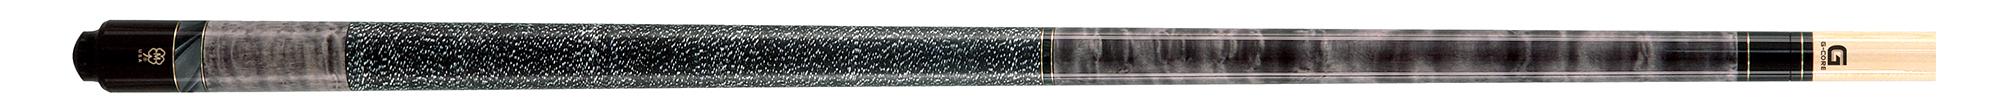 PK3007: McDermott G210 Titanium Grey pool Gewicht: 19Oz #1